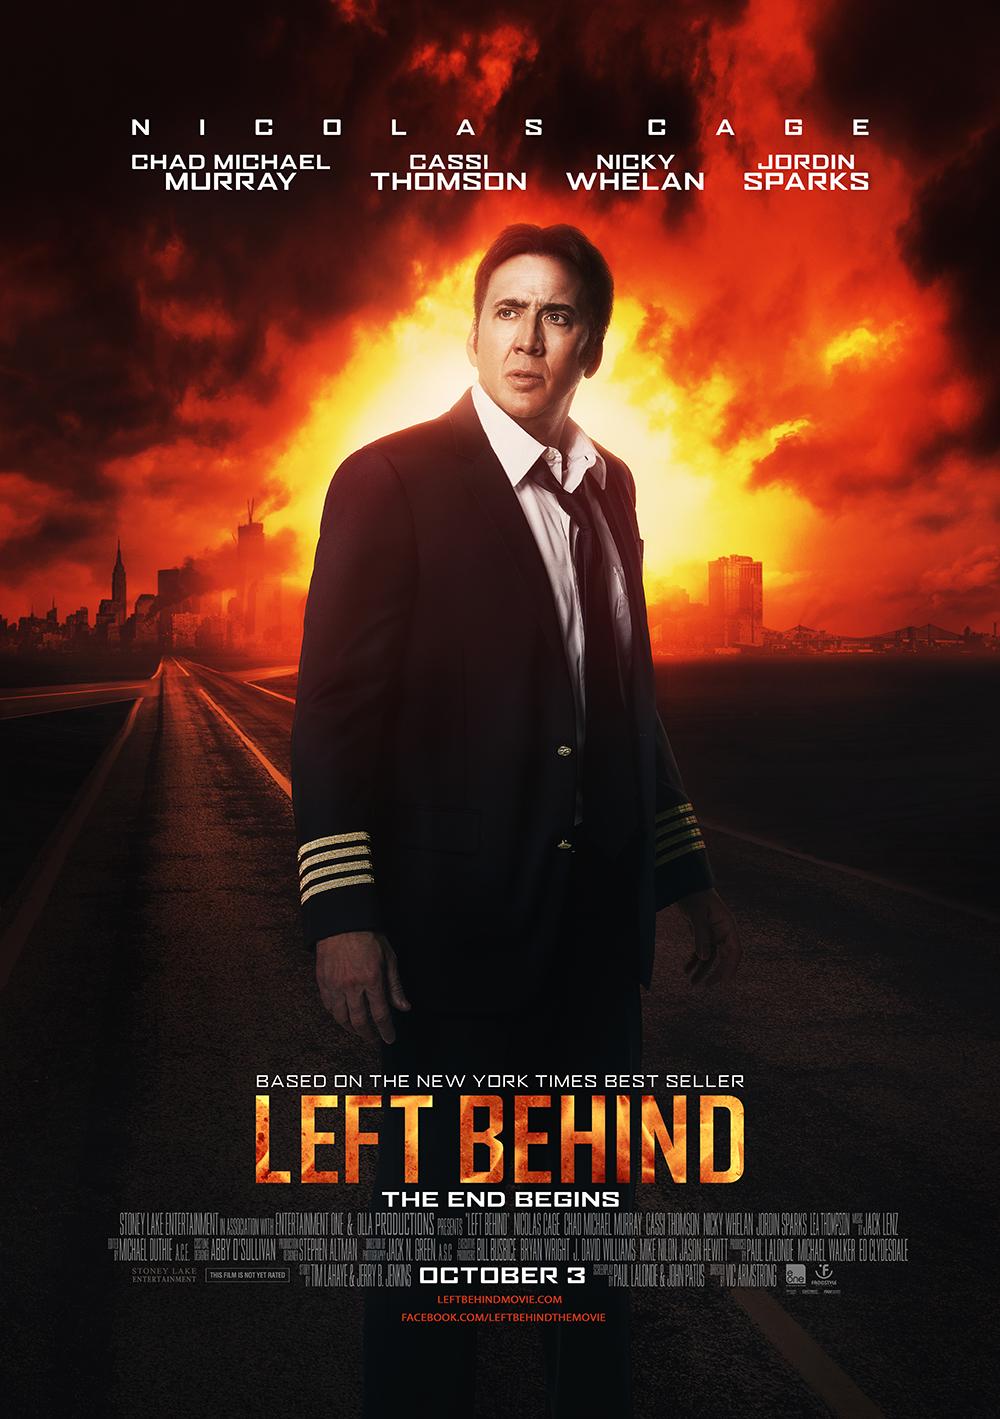 LeftBehind_revised_domestic_72dpi